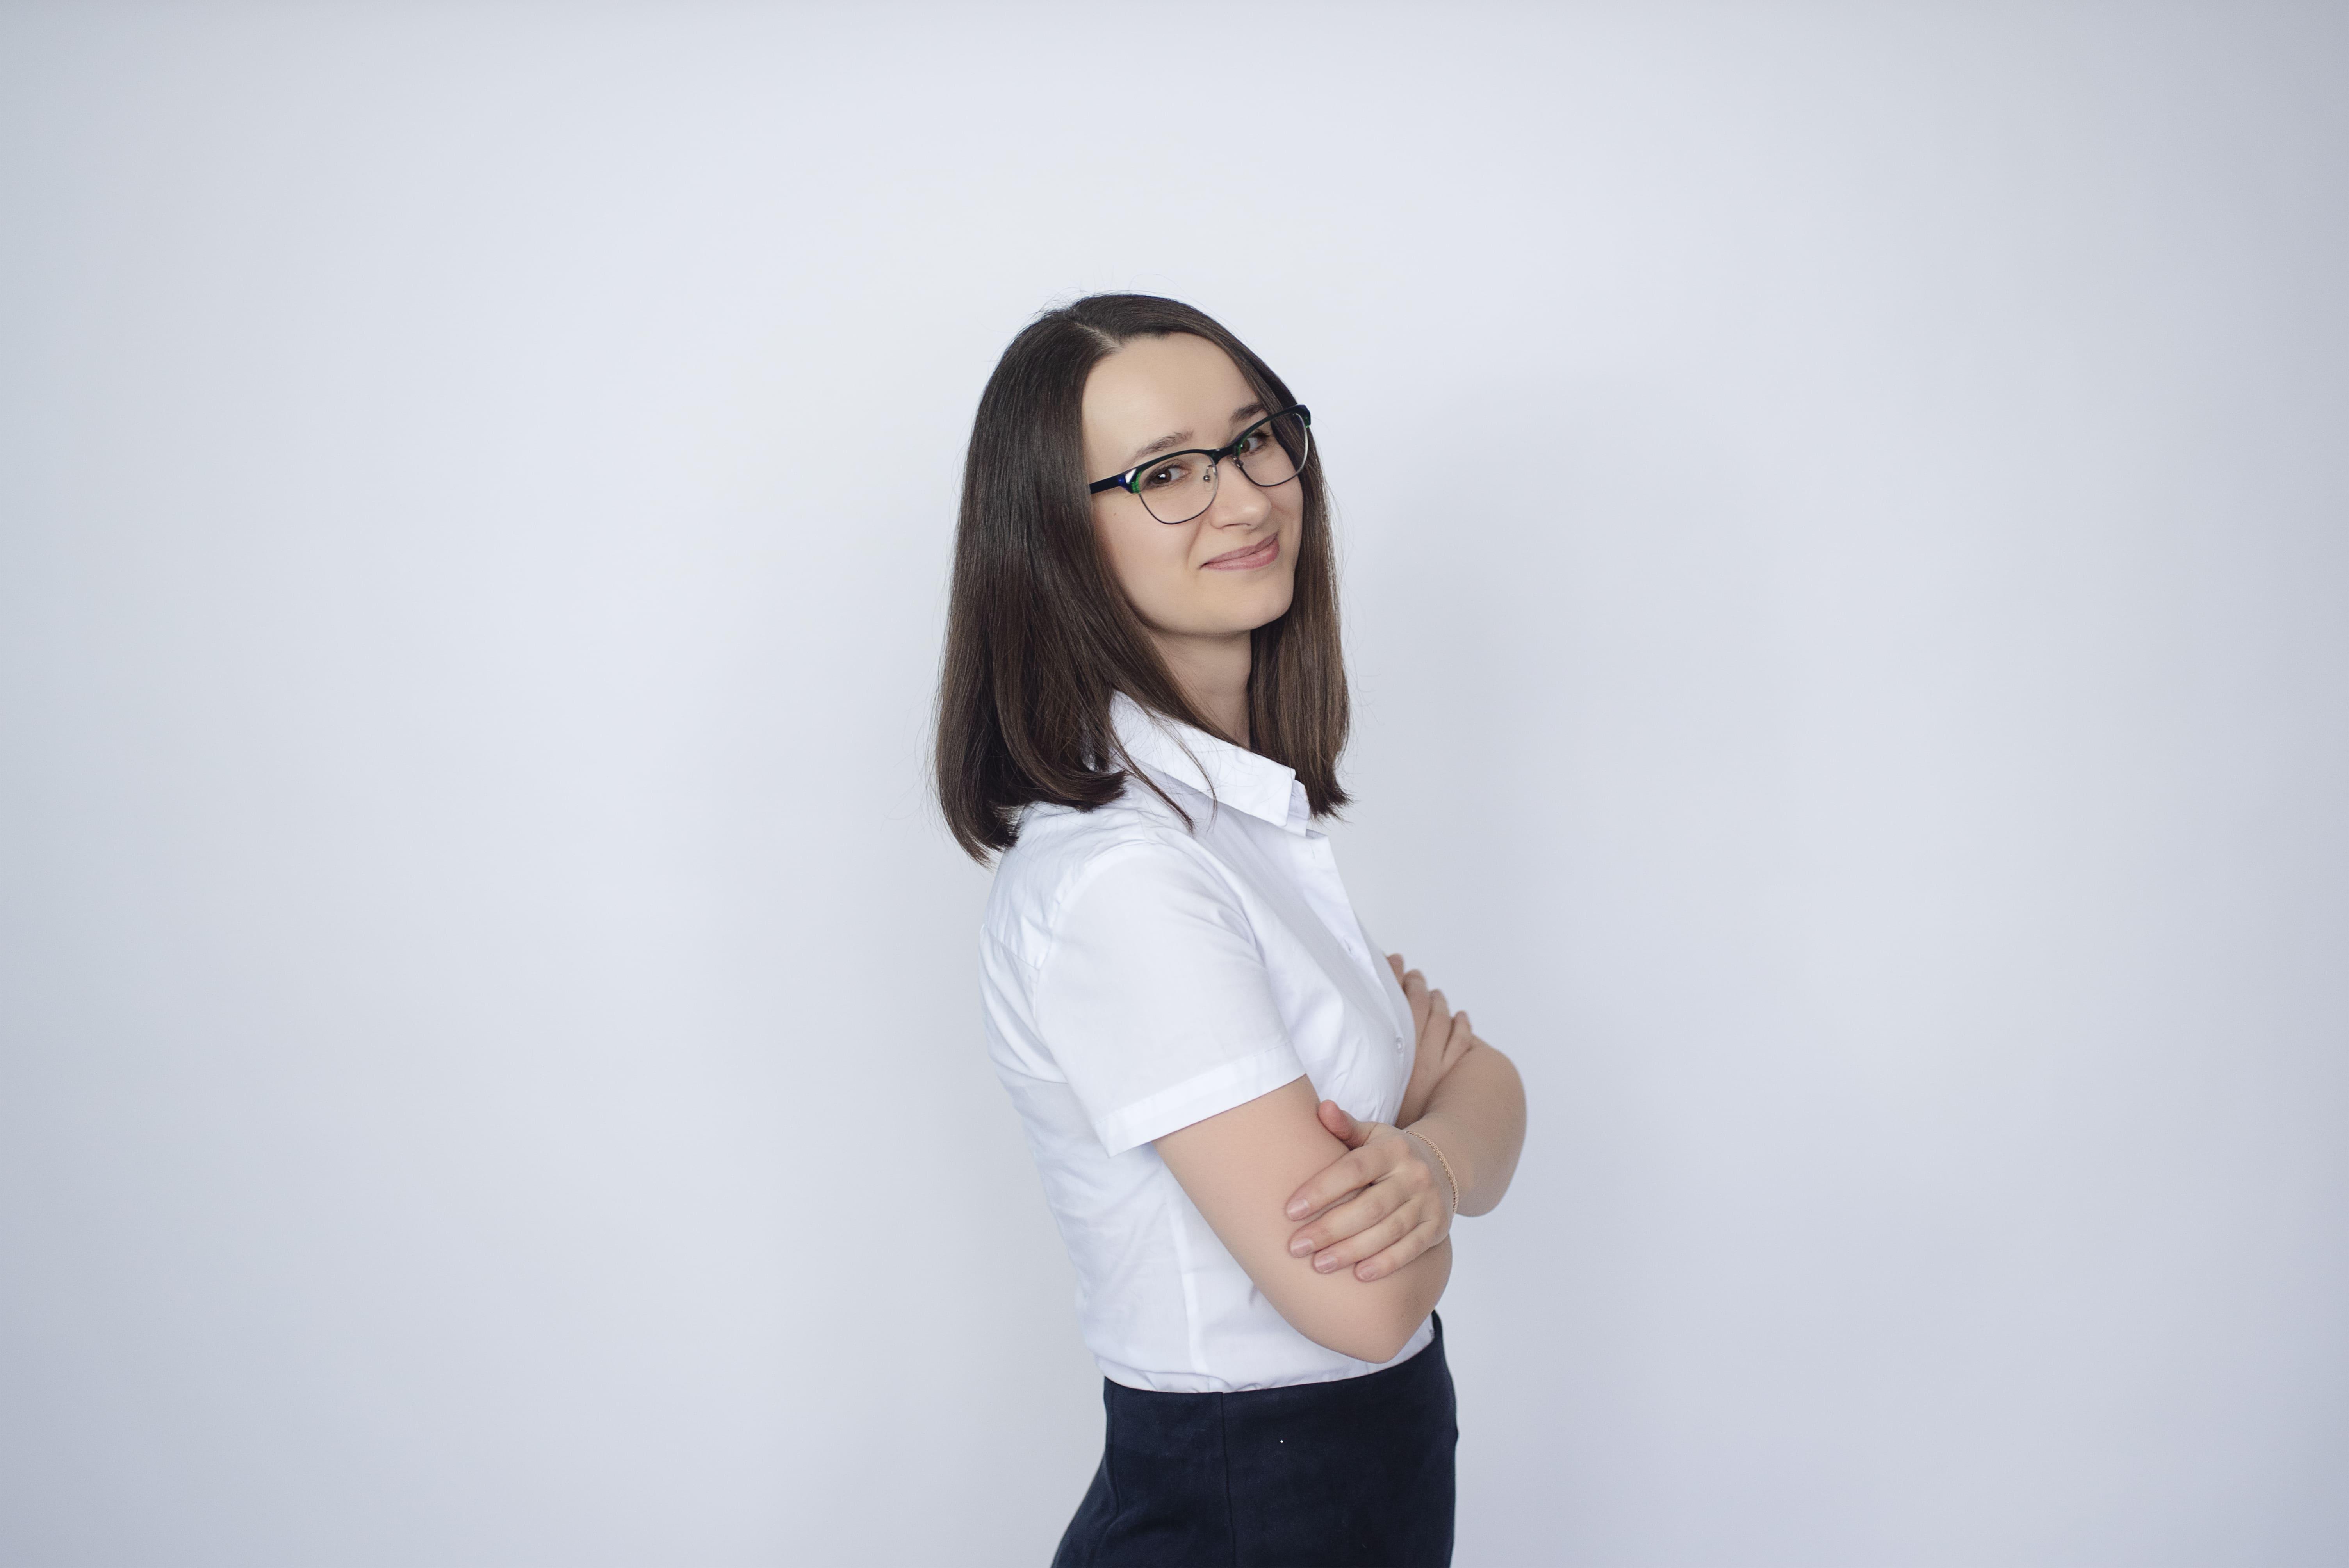 Кристина Титкова – врач дерматолог, косметолог, генетический консультант, эксперт журнала COLADY